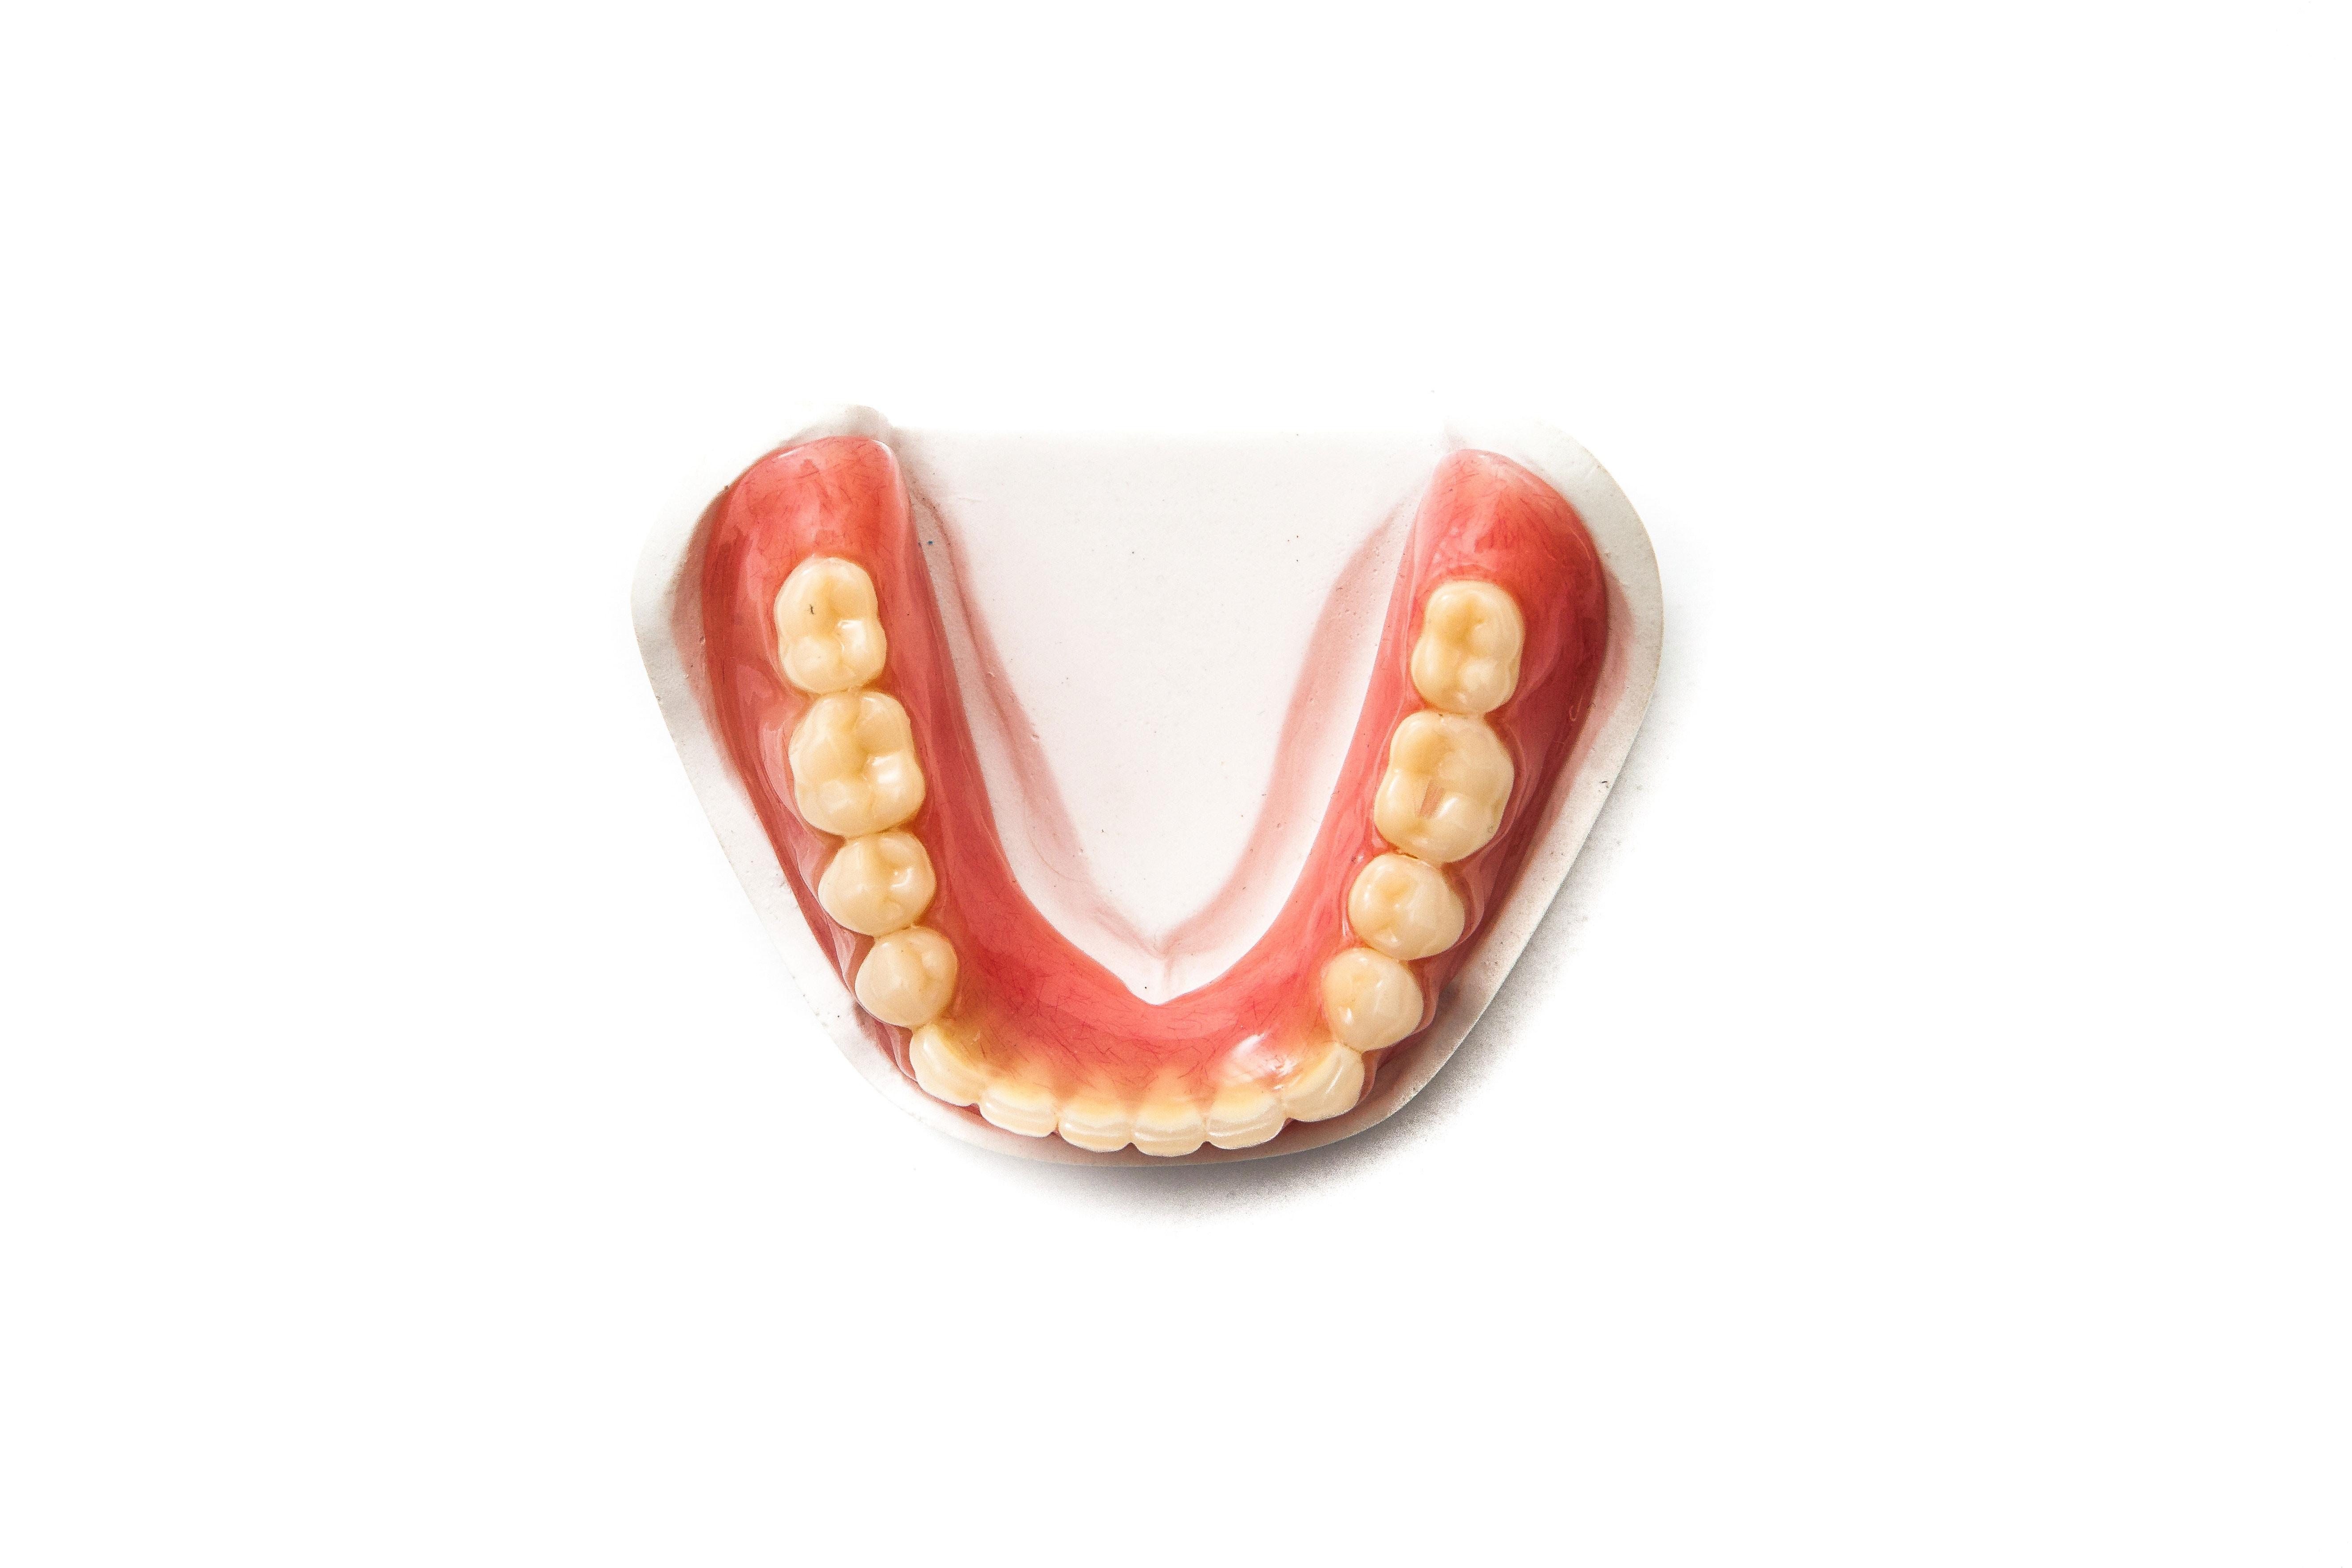 occlusal view denture